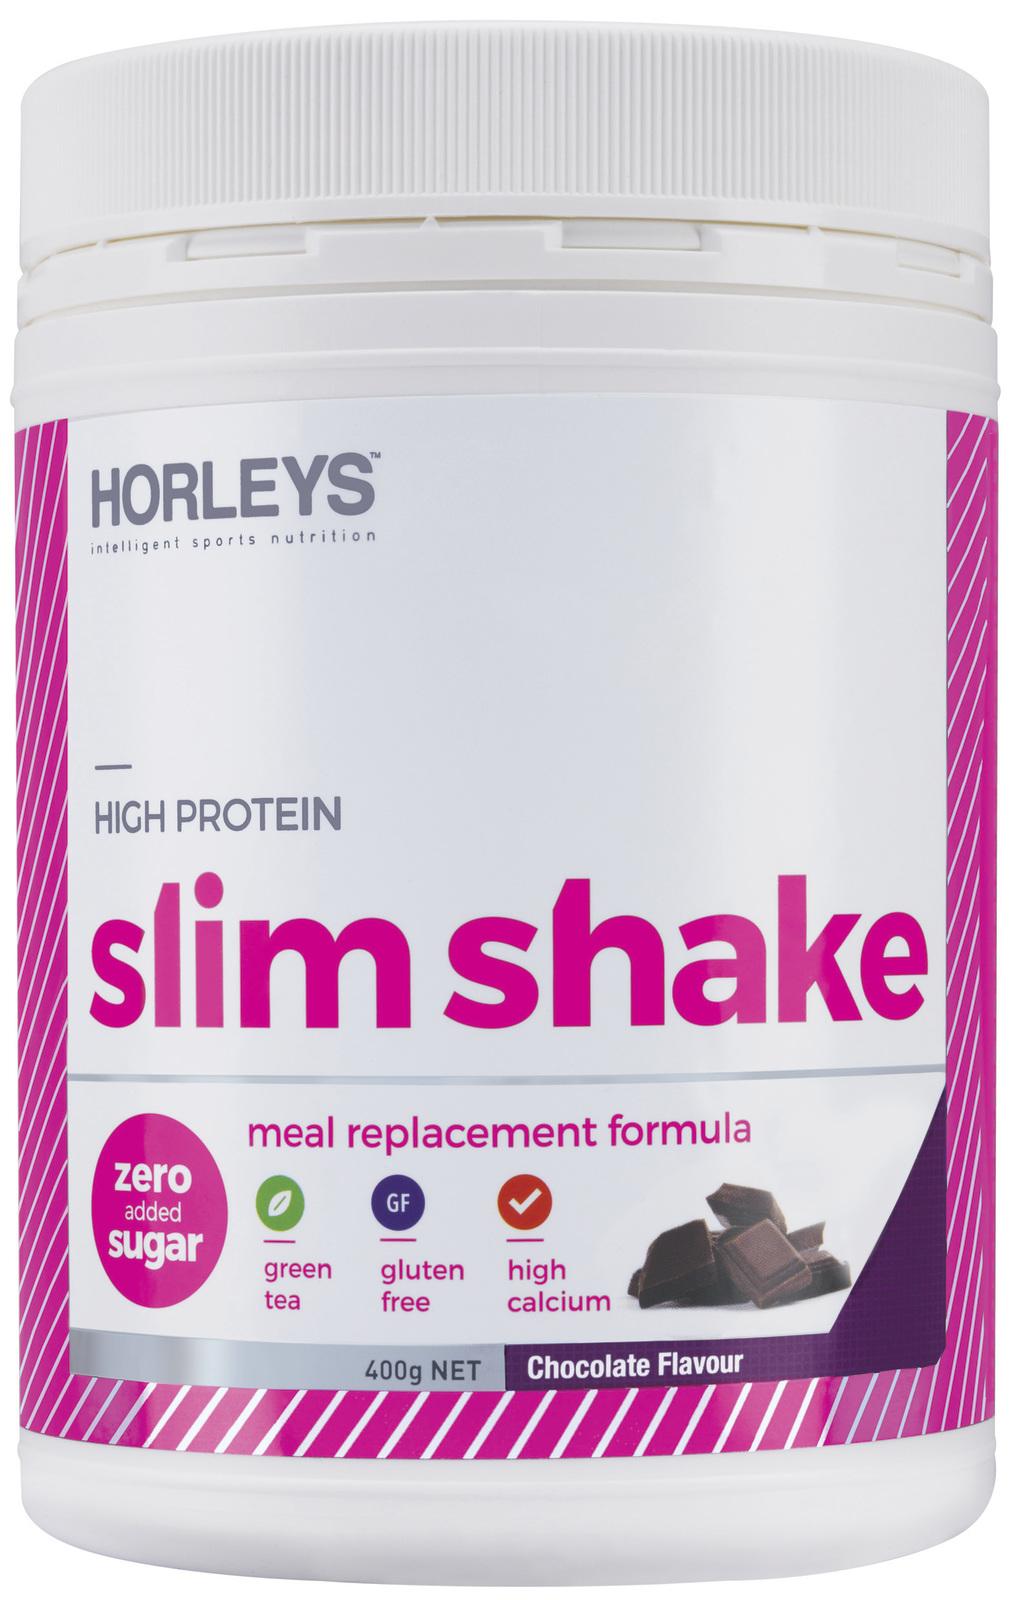 Horleys Slim Shake Protein Powder image